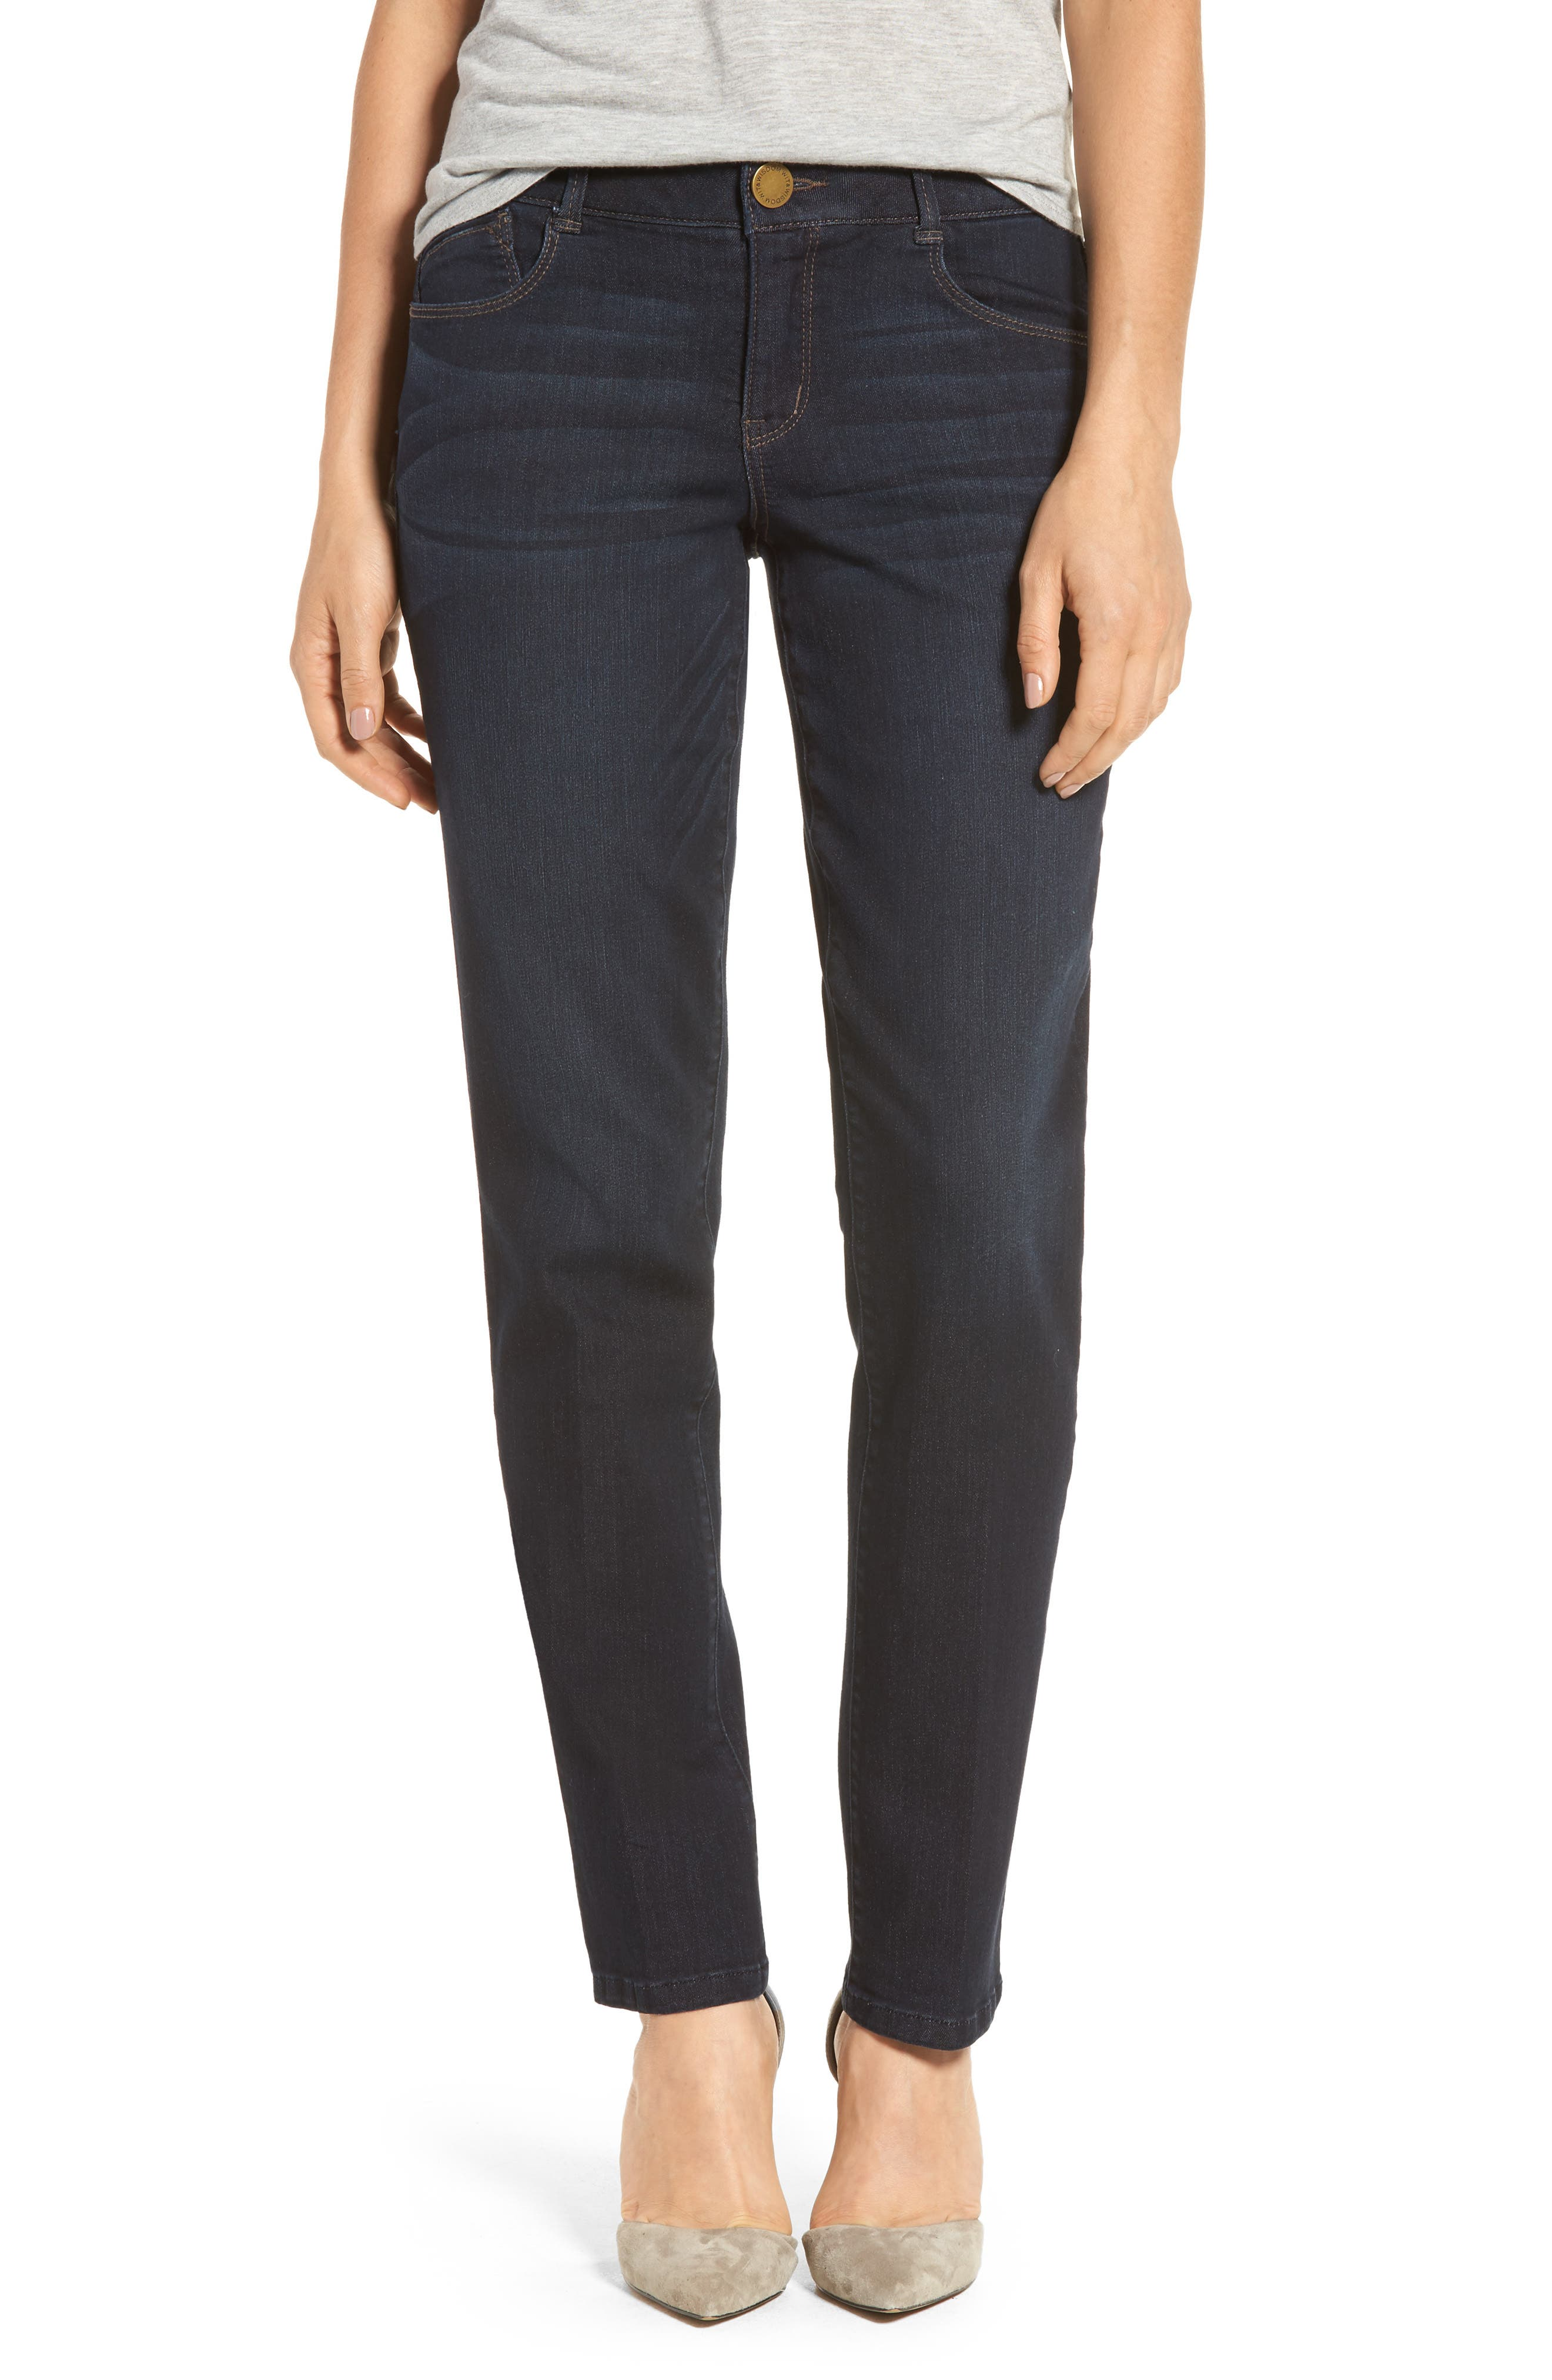 Ab-solution Straight Leg Jeans,                             Main thumbnail 1, color,                             Indigo